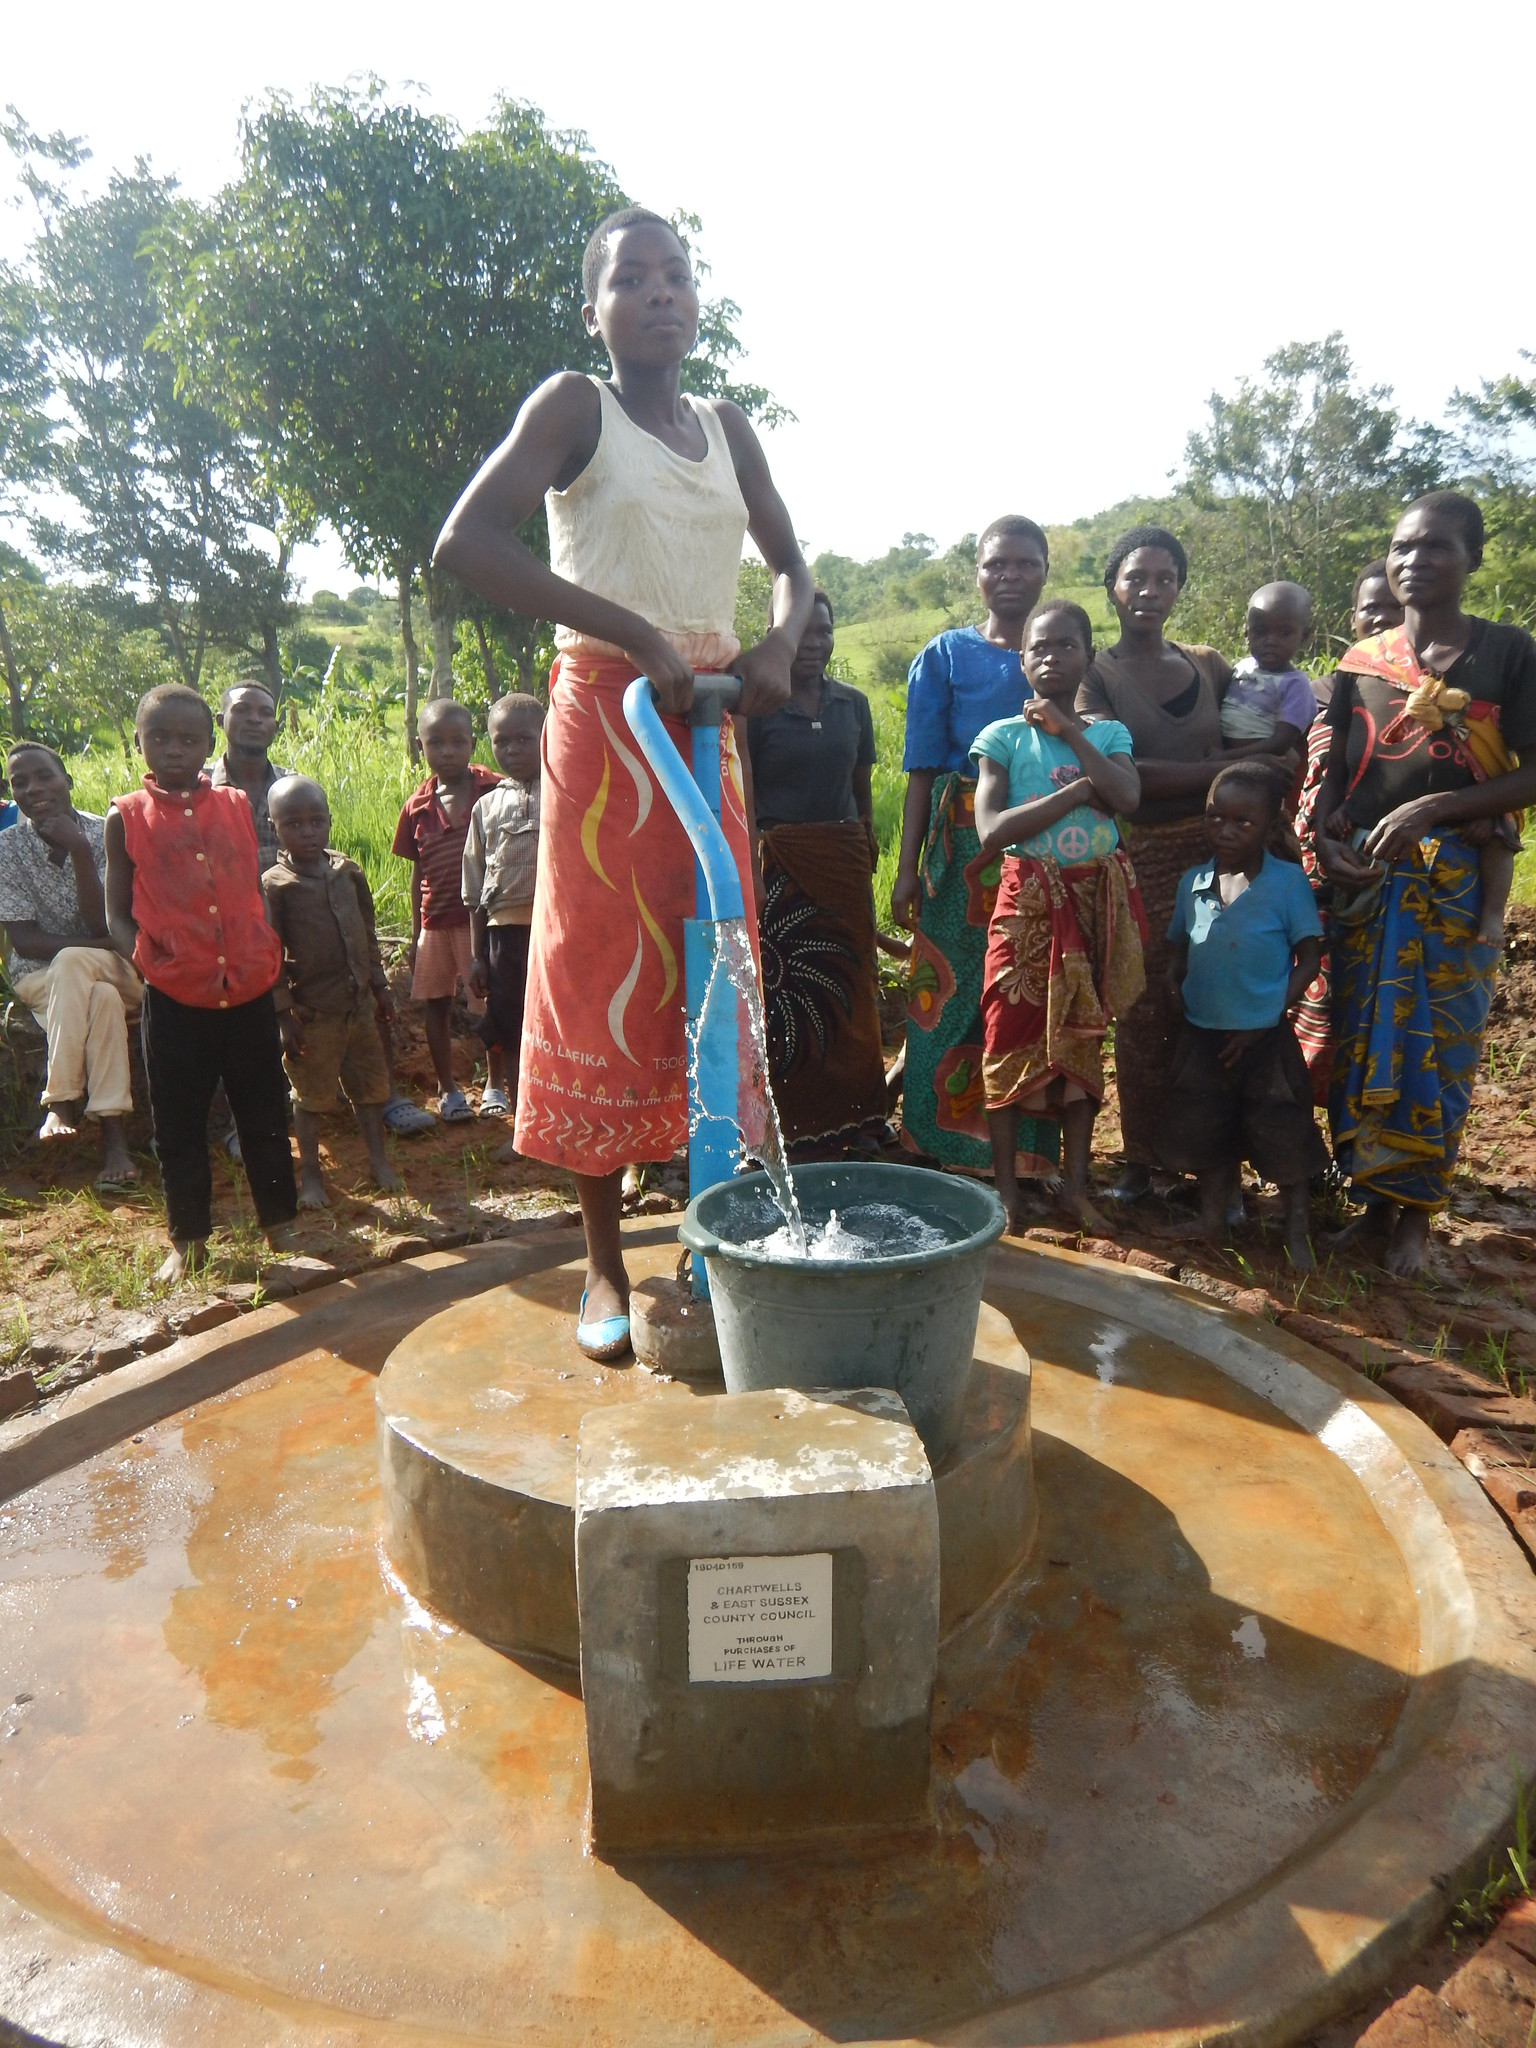 Kankhungo - pump 19D4D159